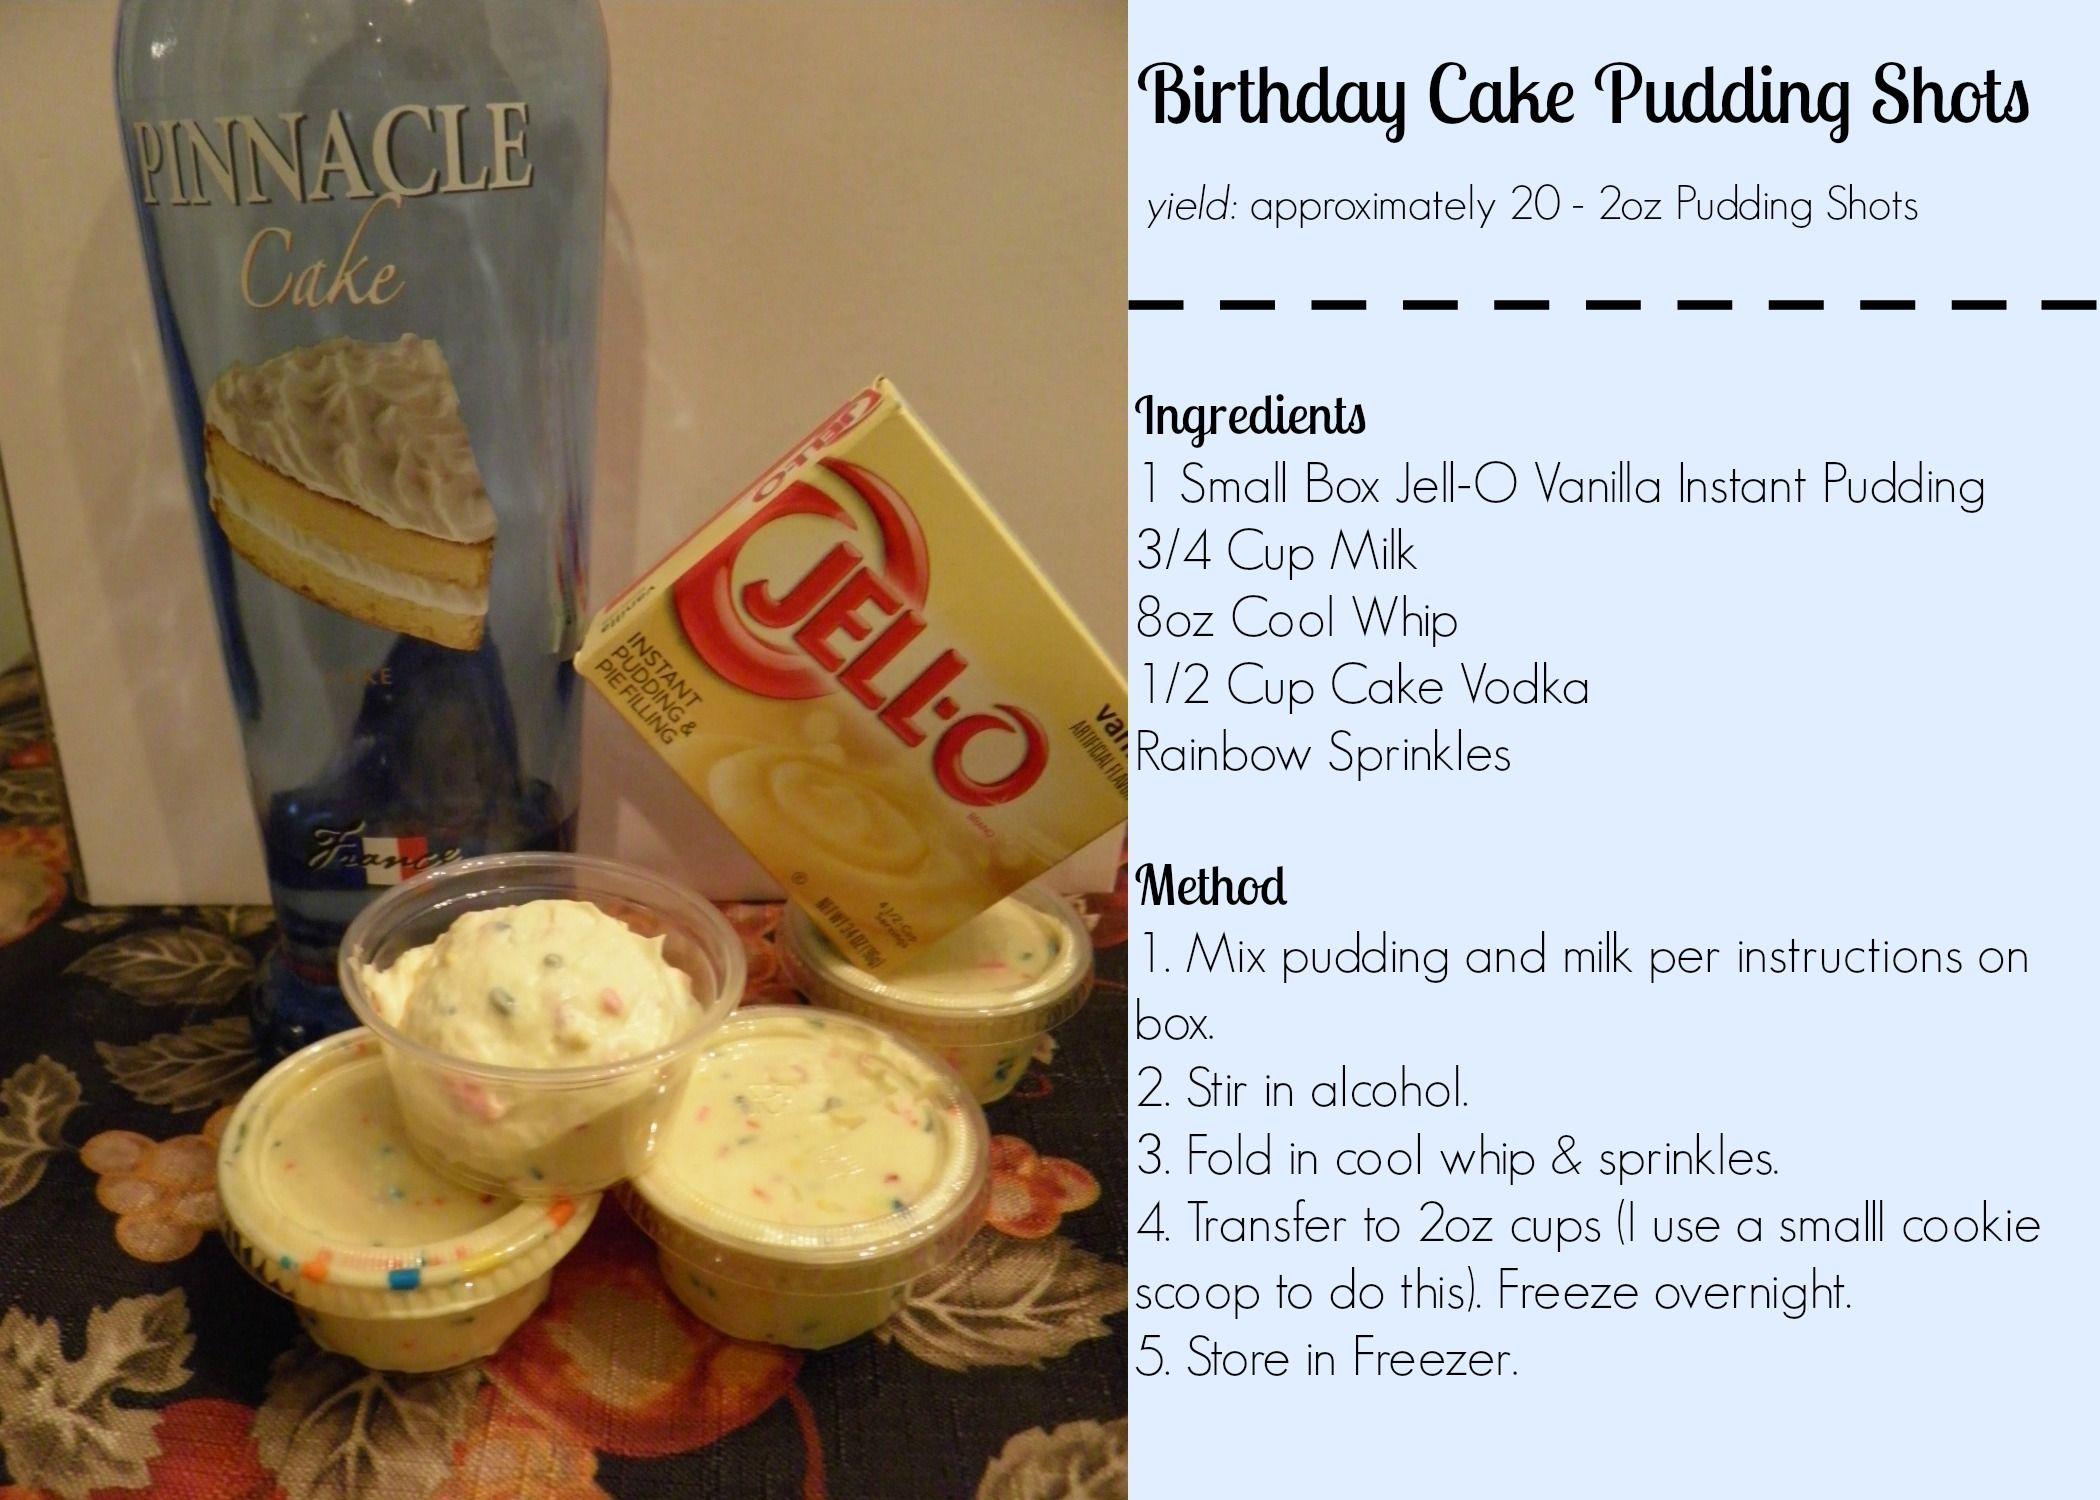 Birthday Cake Pudding Shots Pudding Shots Birthday Cake Shots Shot Recipes